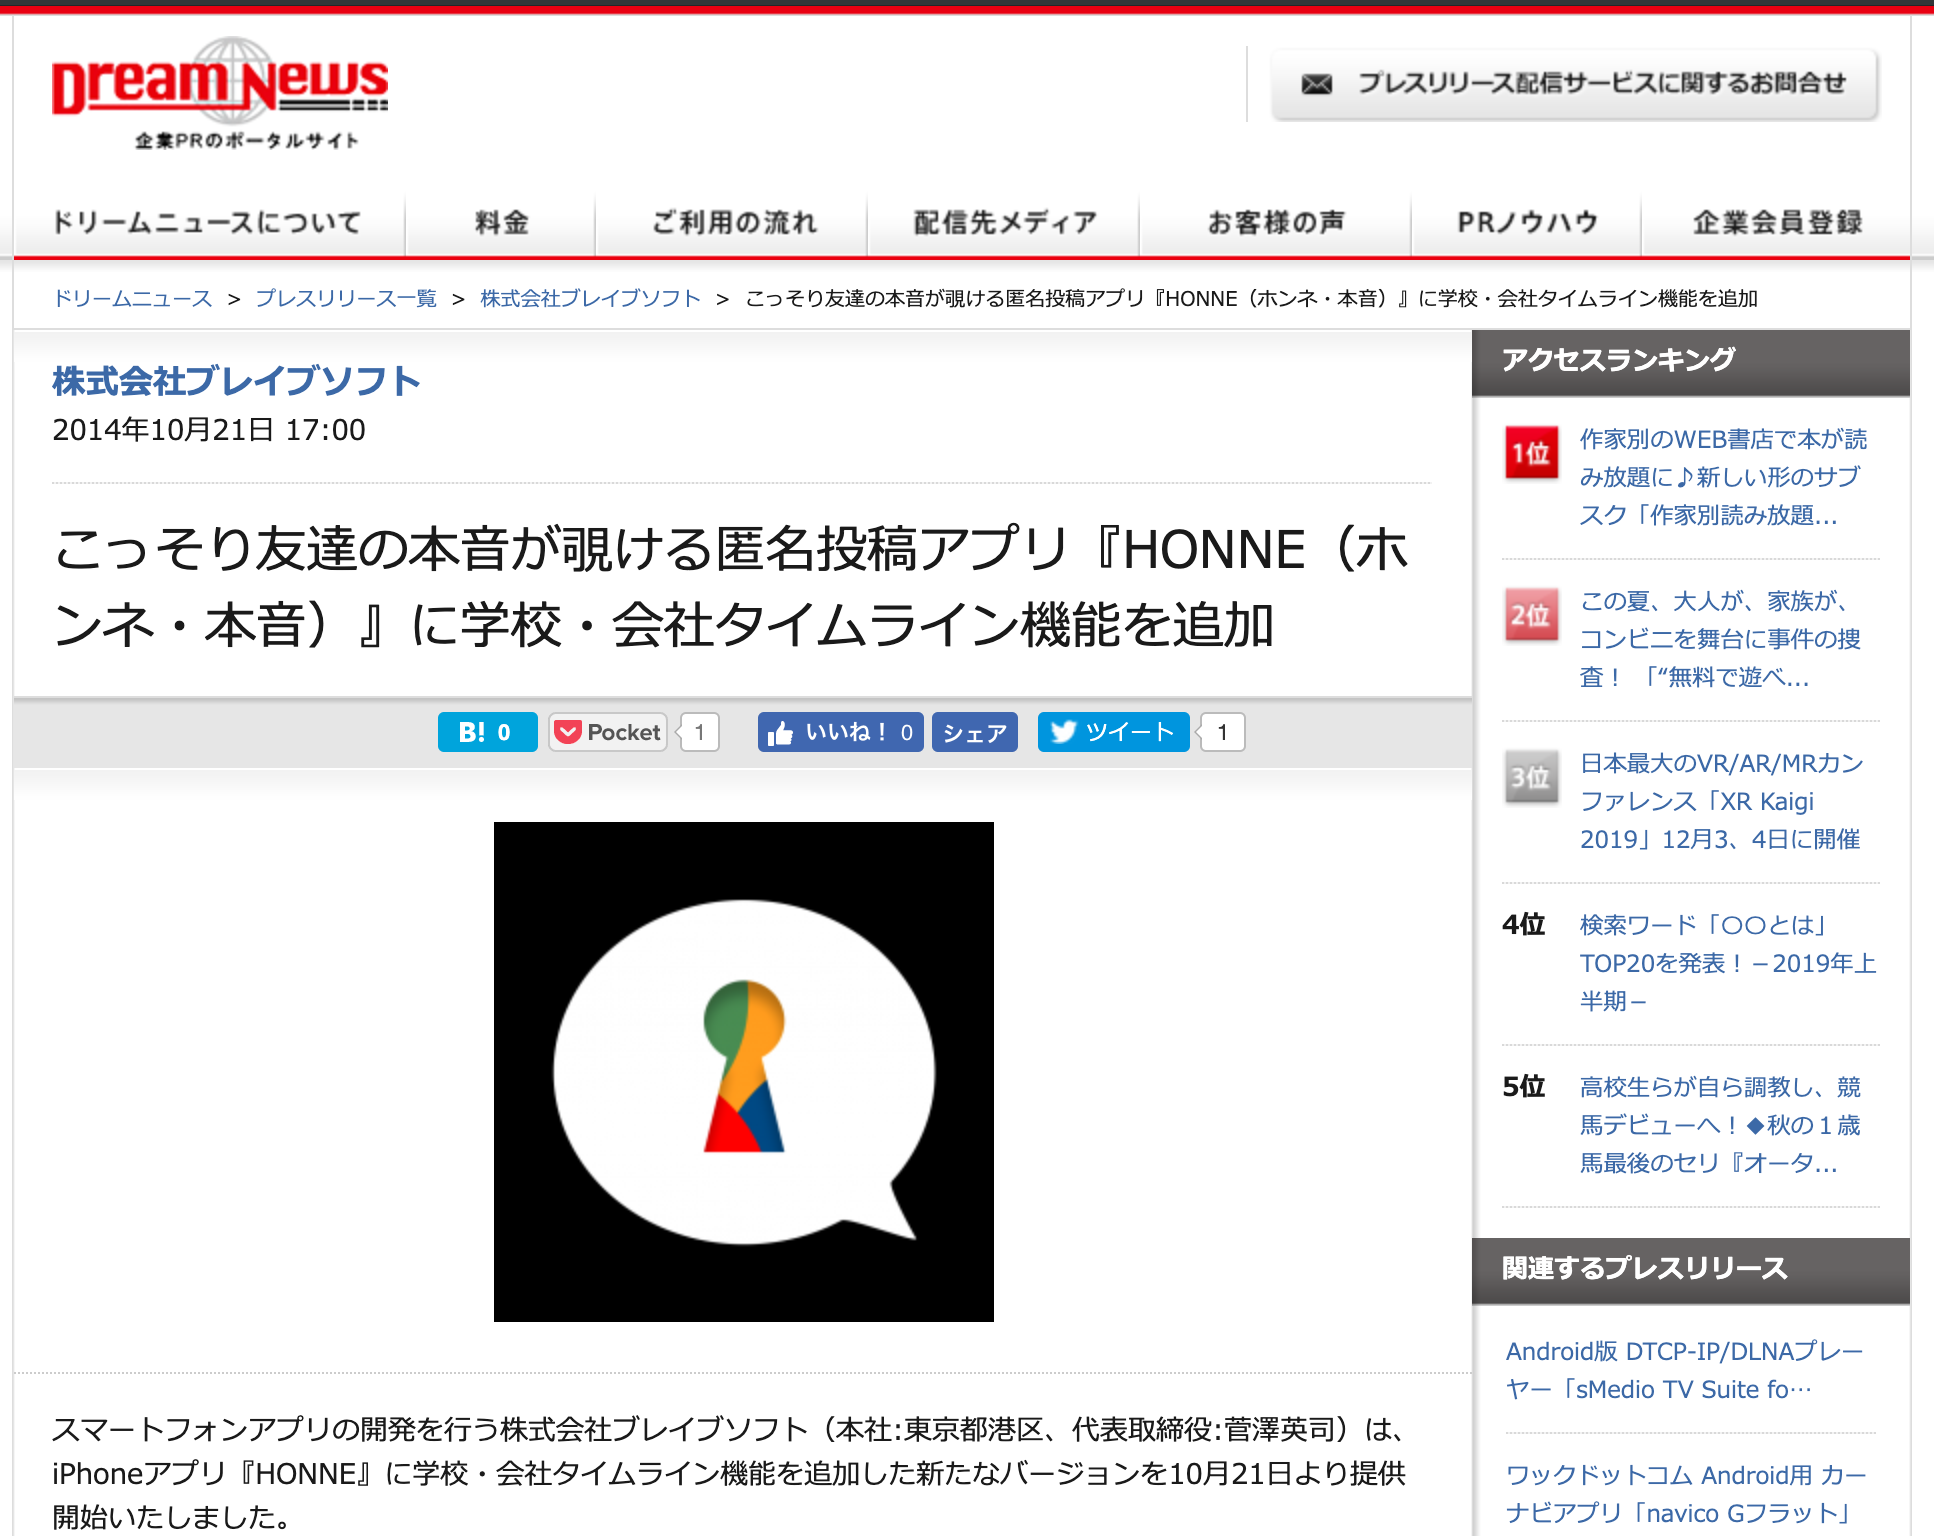 HONNE新機能をDreamNews様にご掲載いただく